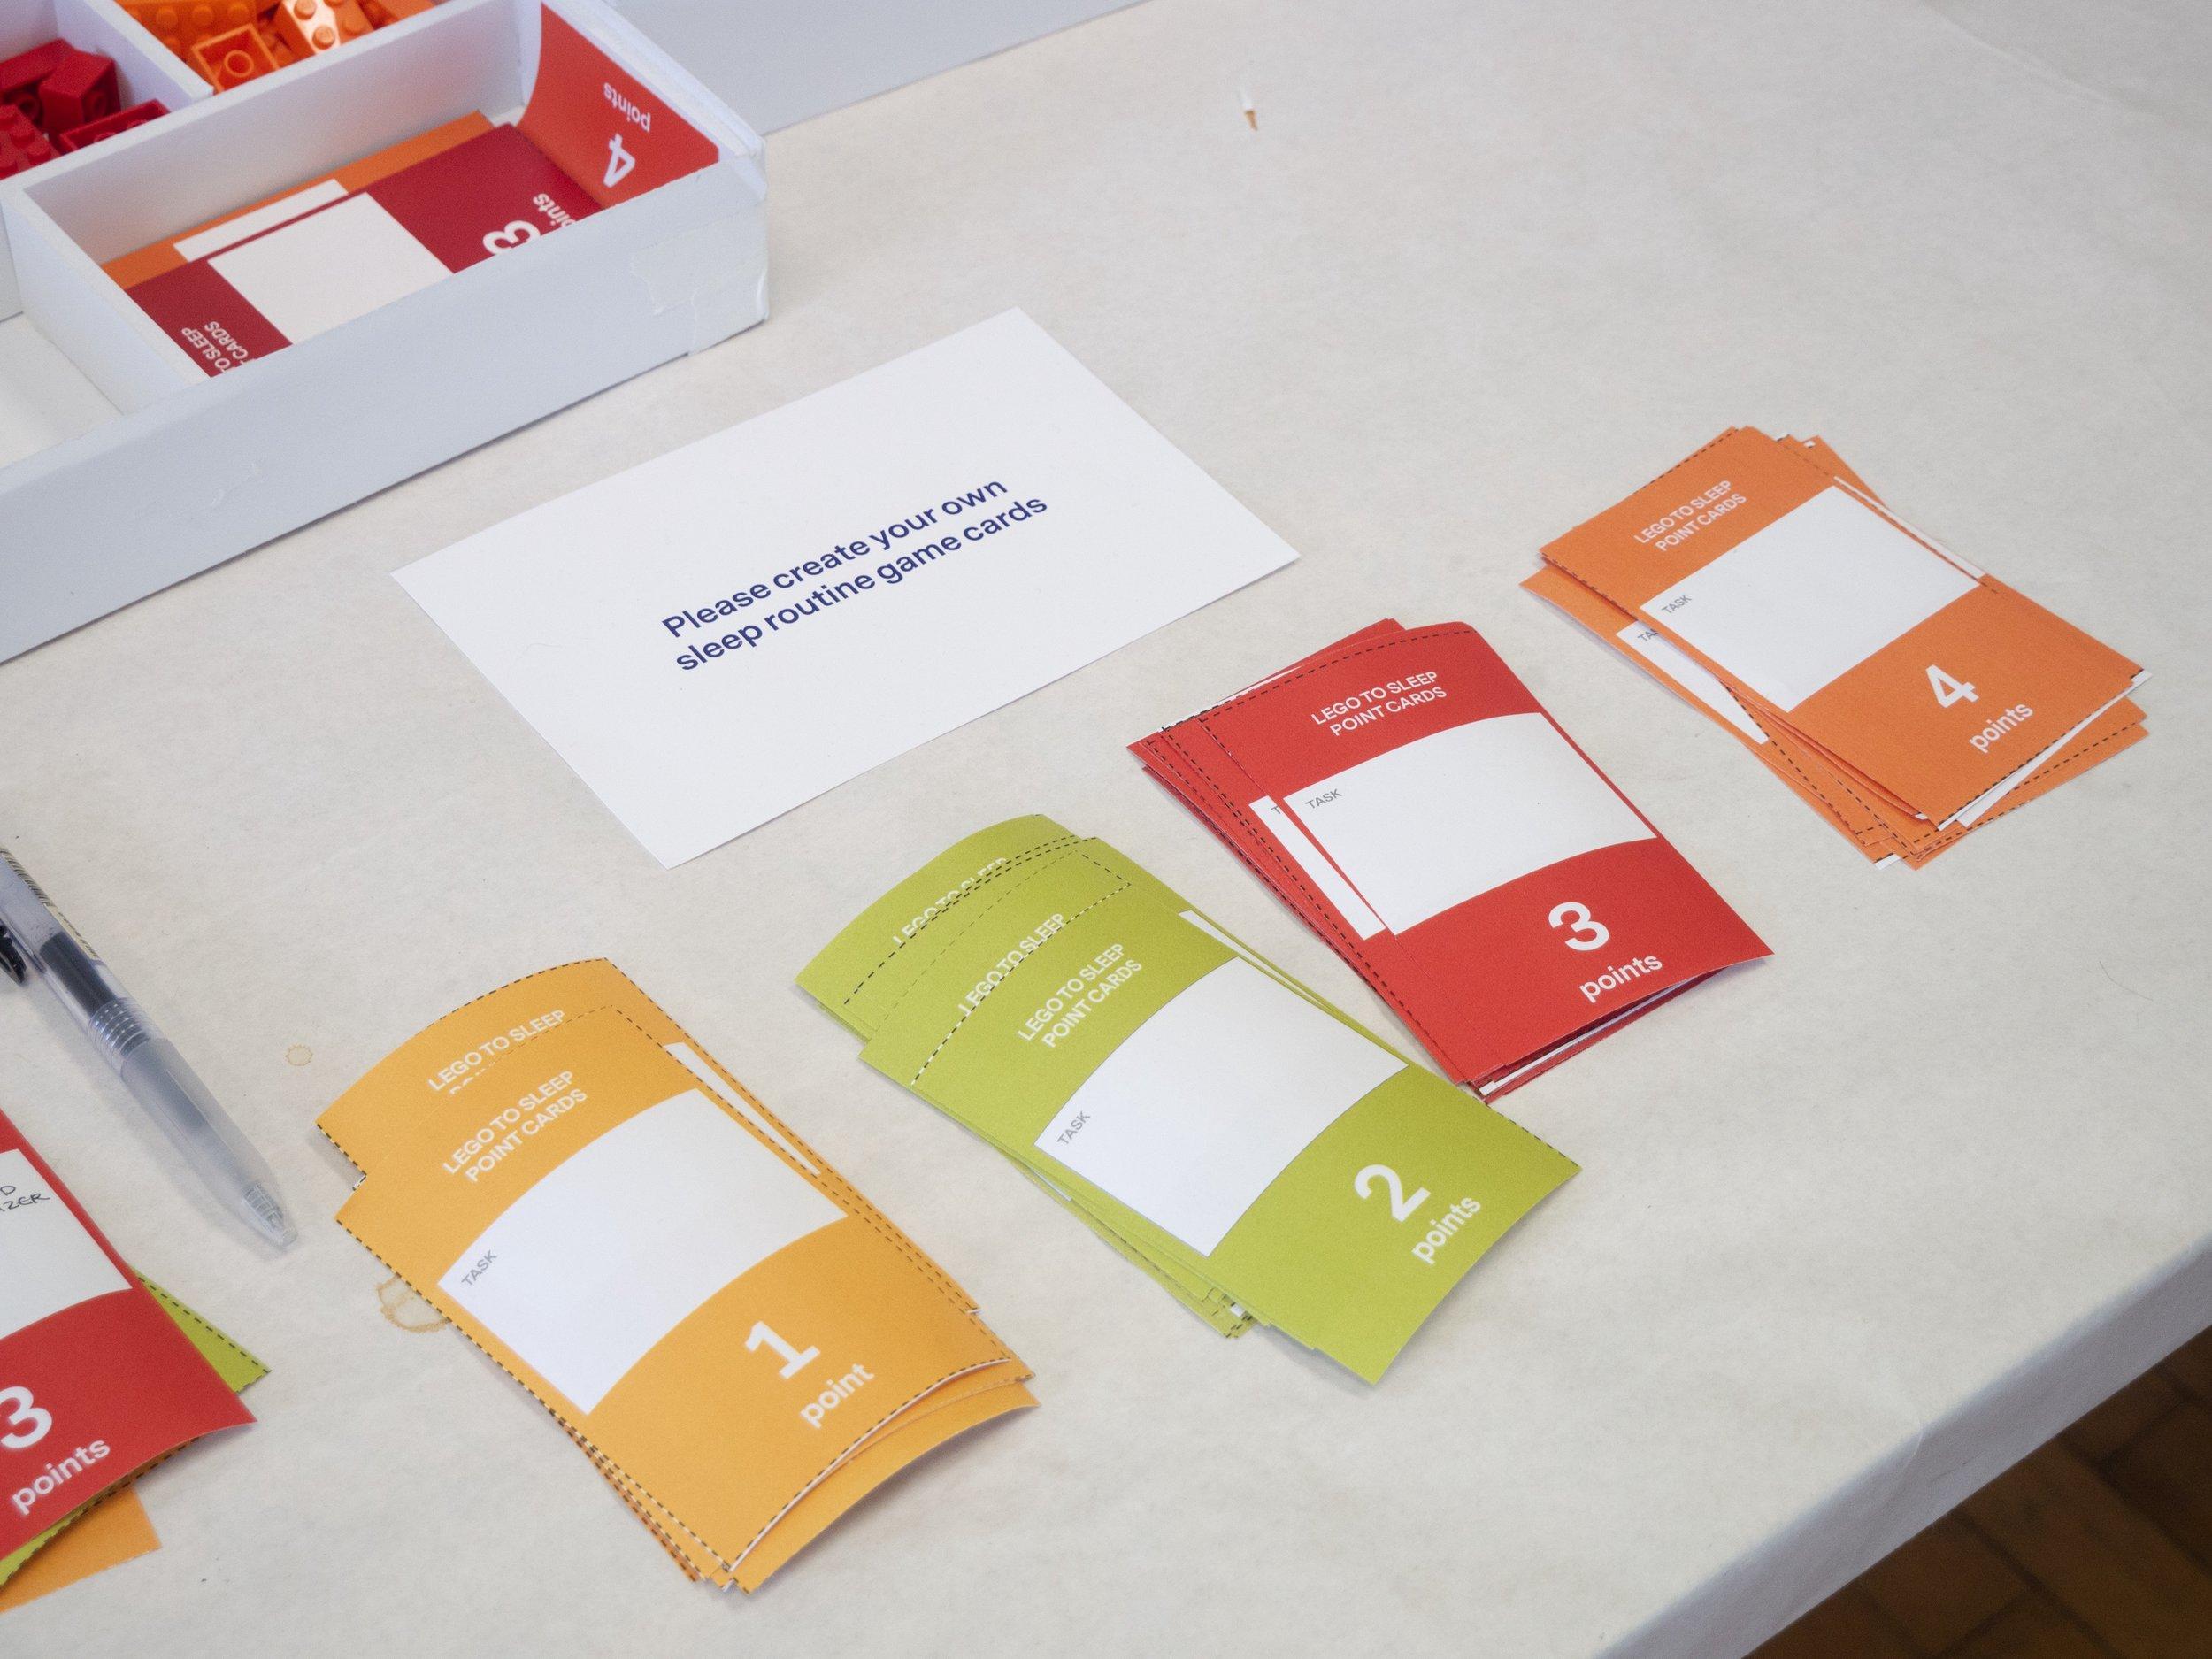 Participants create their own sleep point cards.